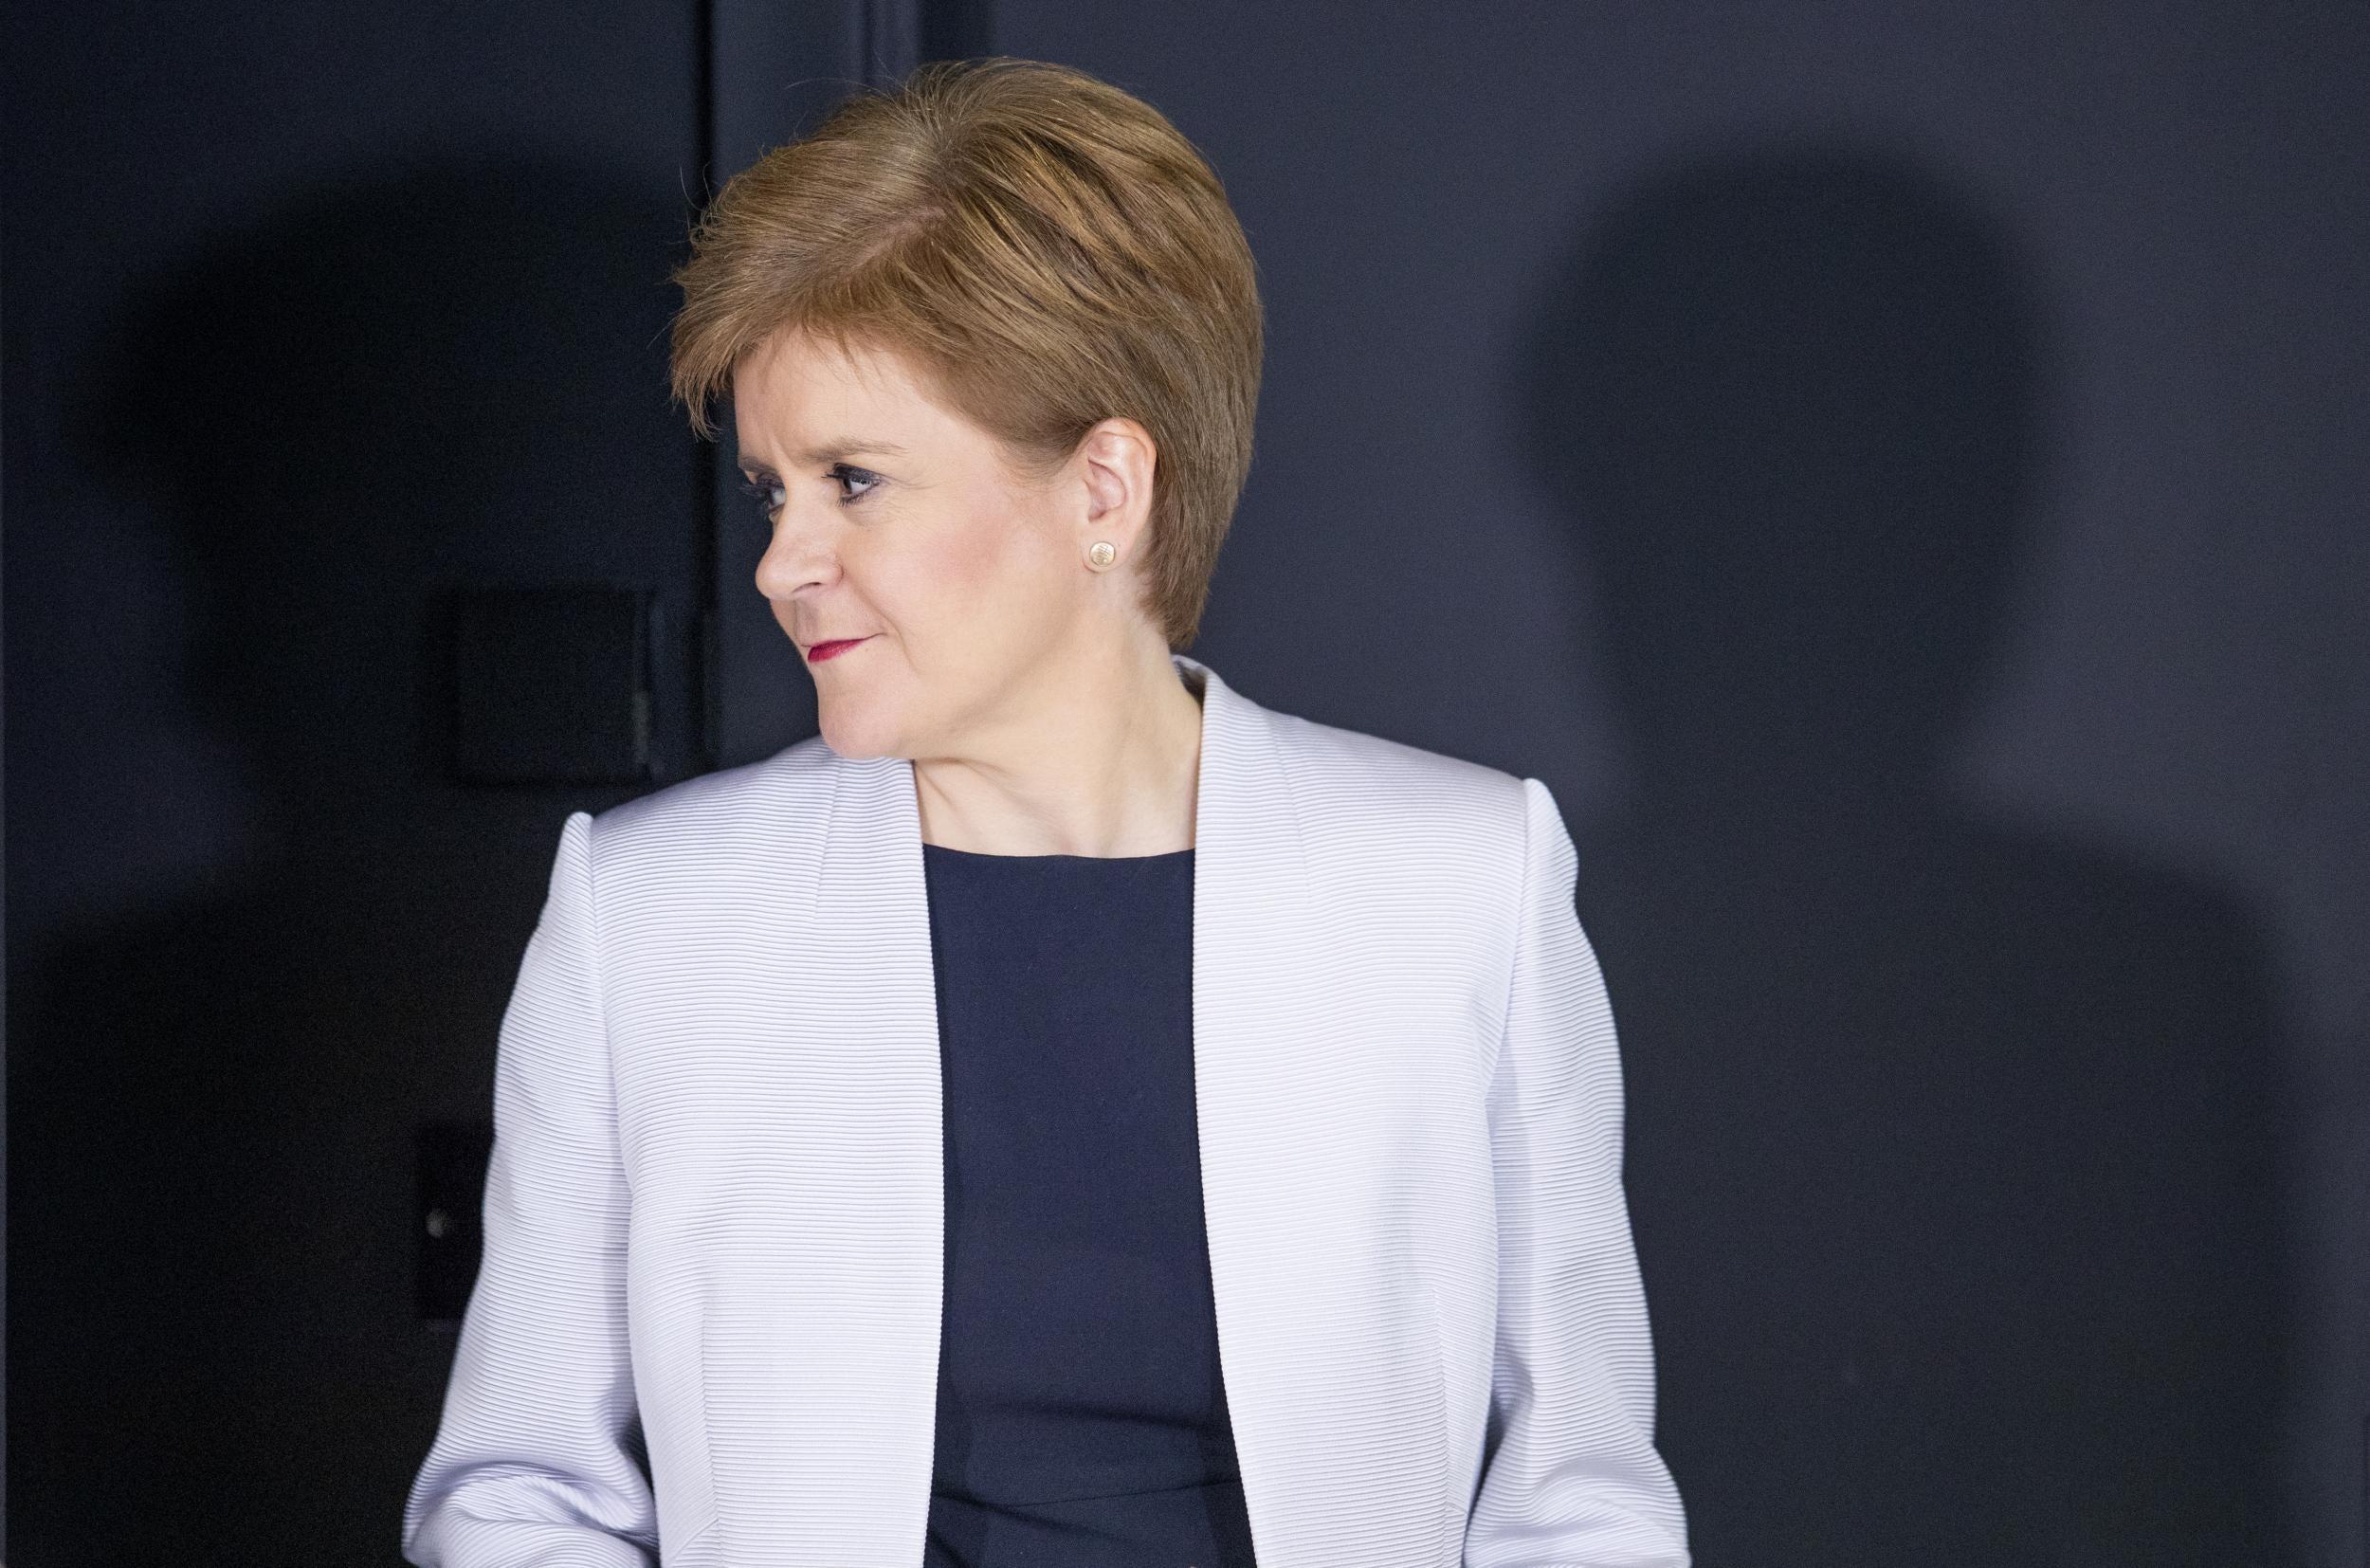 Coronavirus Scotland: Two households can meet outside as of tomorrow, Sturgeon announces